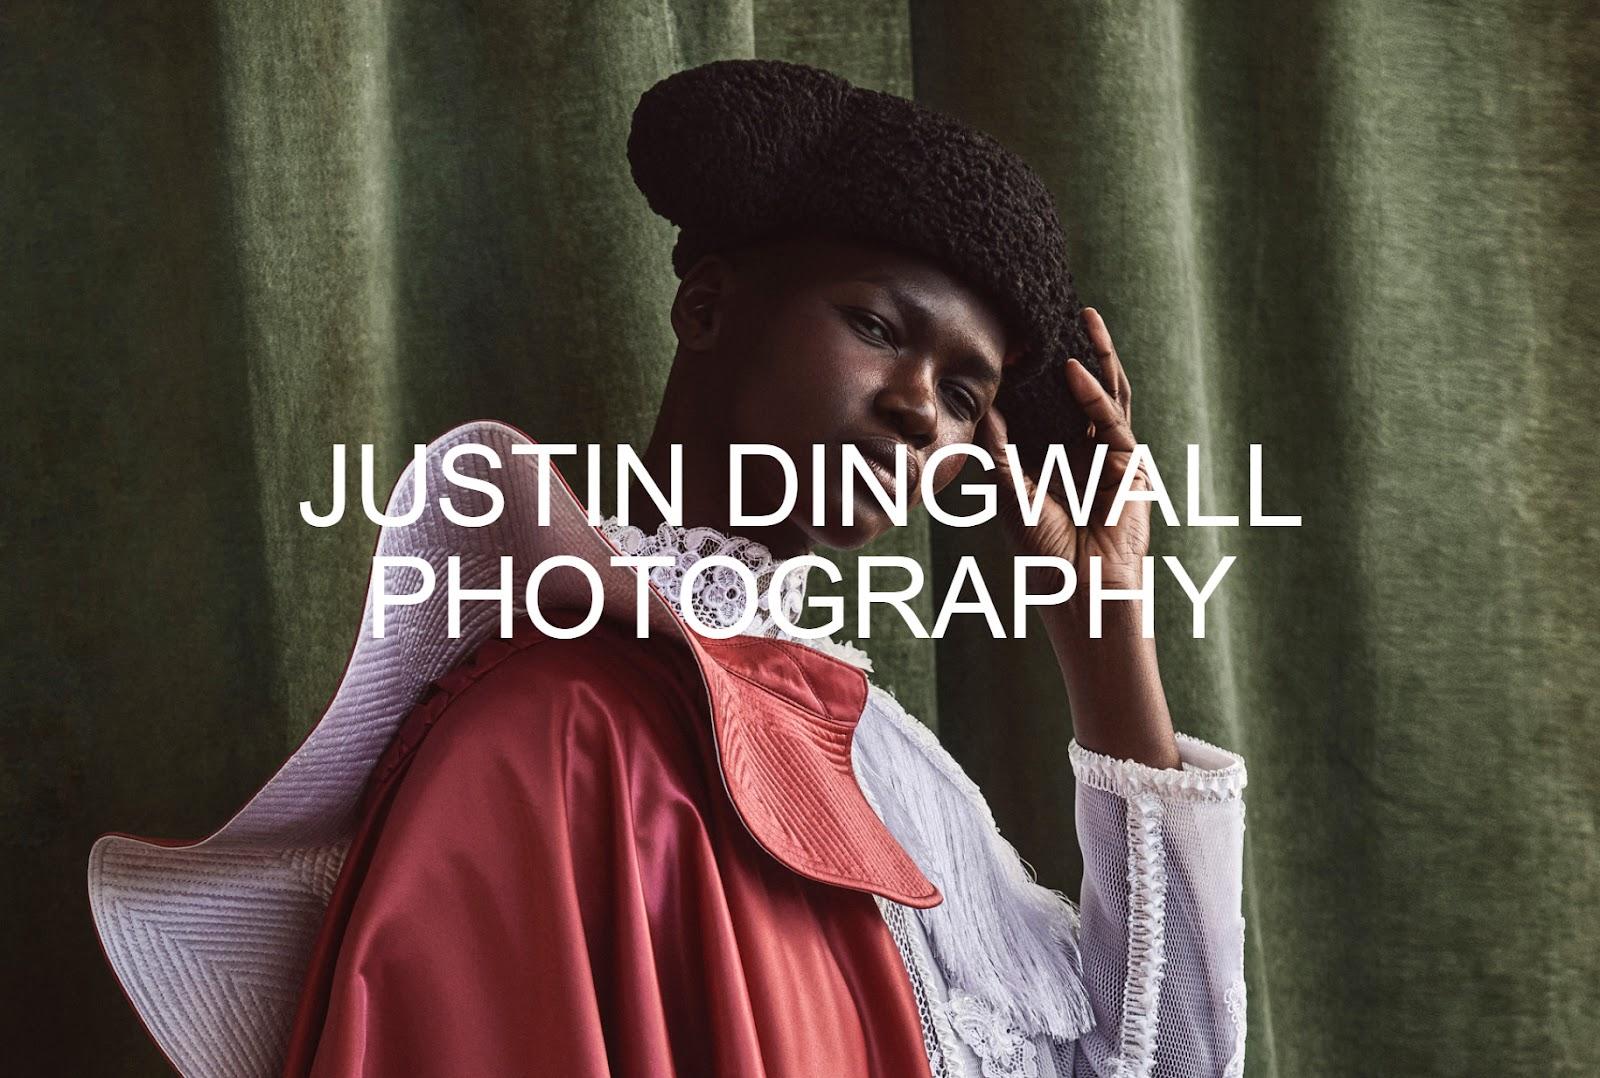 Justin Dingwall homepage